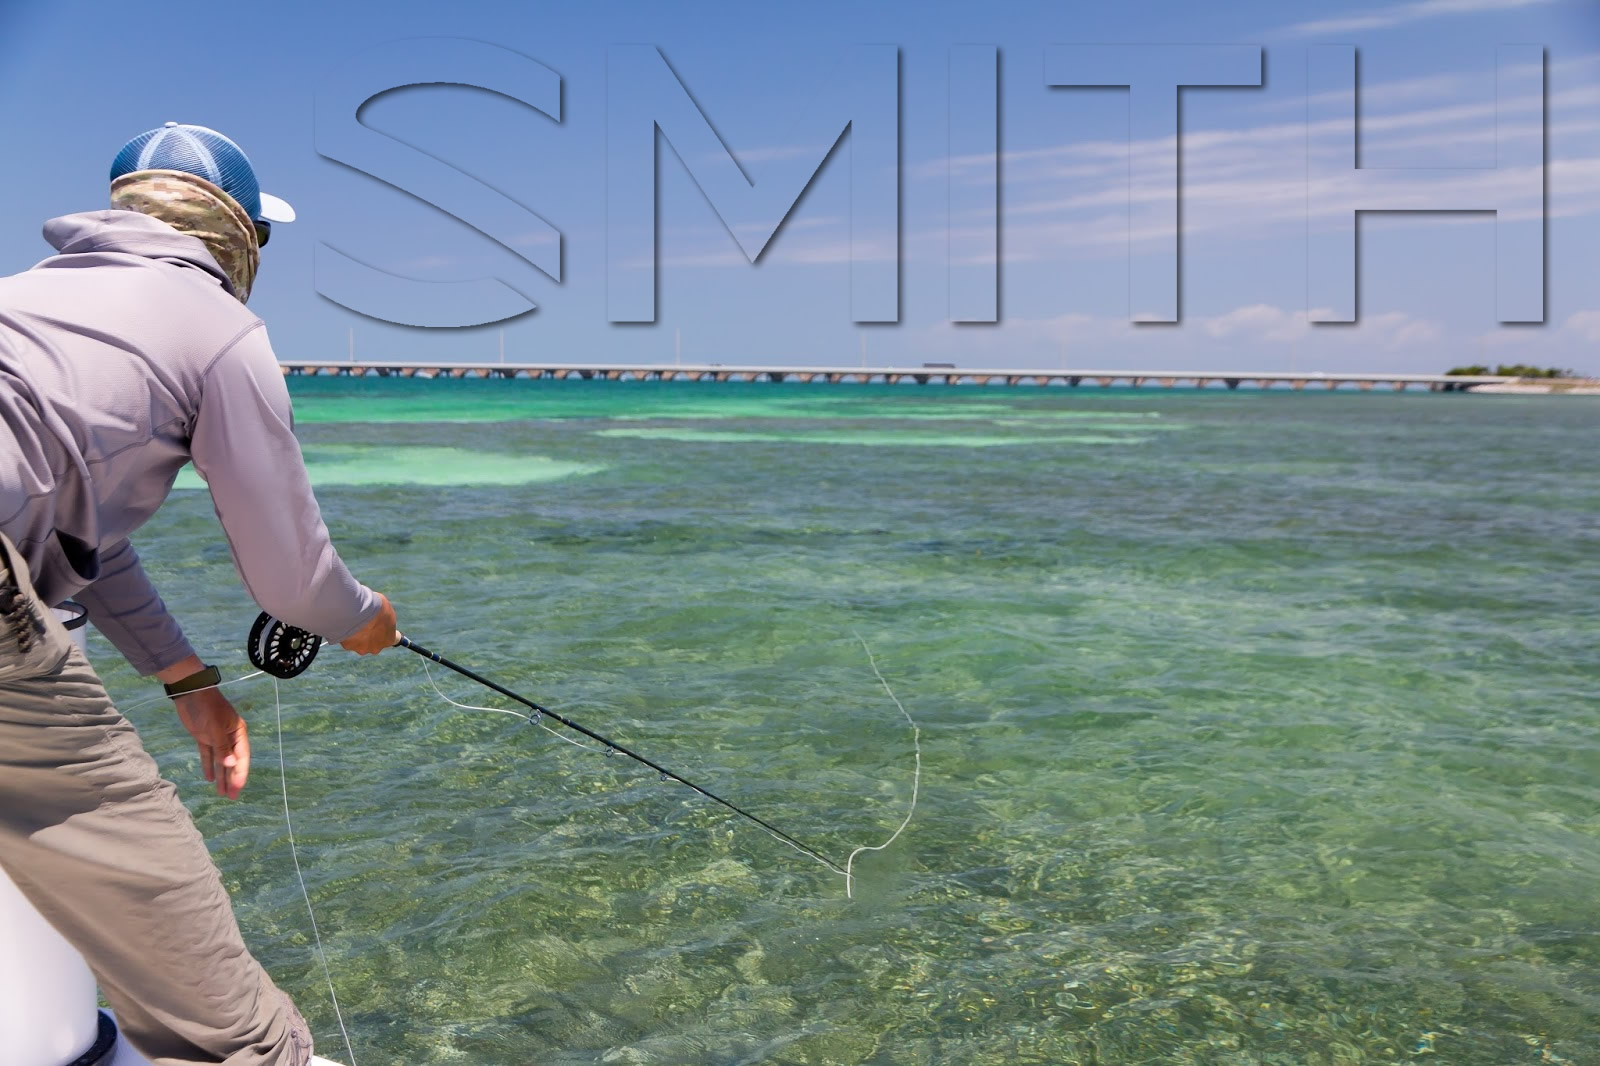 How Smith Optics Changed My (fishing) Life! & Gorge Fly Shop Blog: How Smith Optics Changed My (fishing) Life! azcodes.com